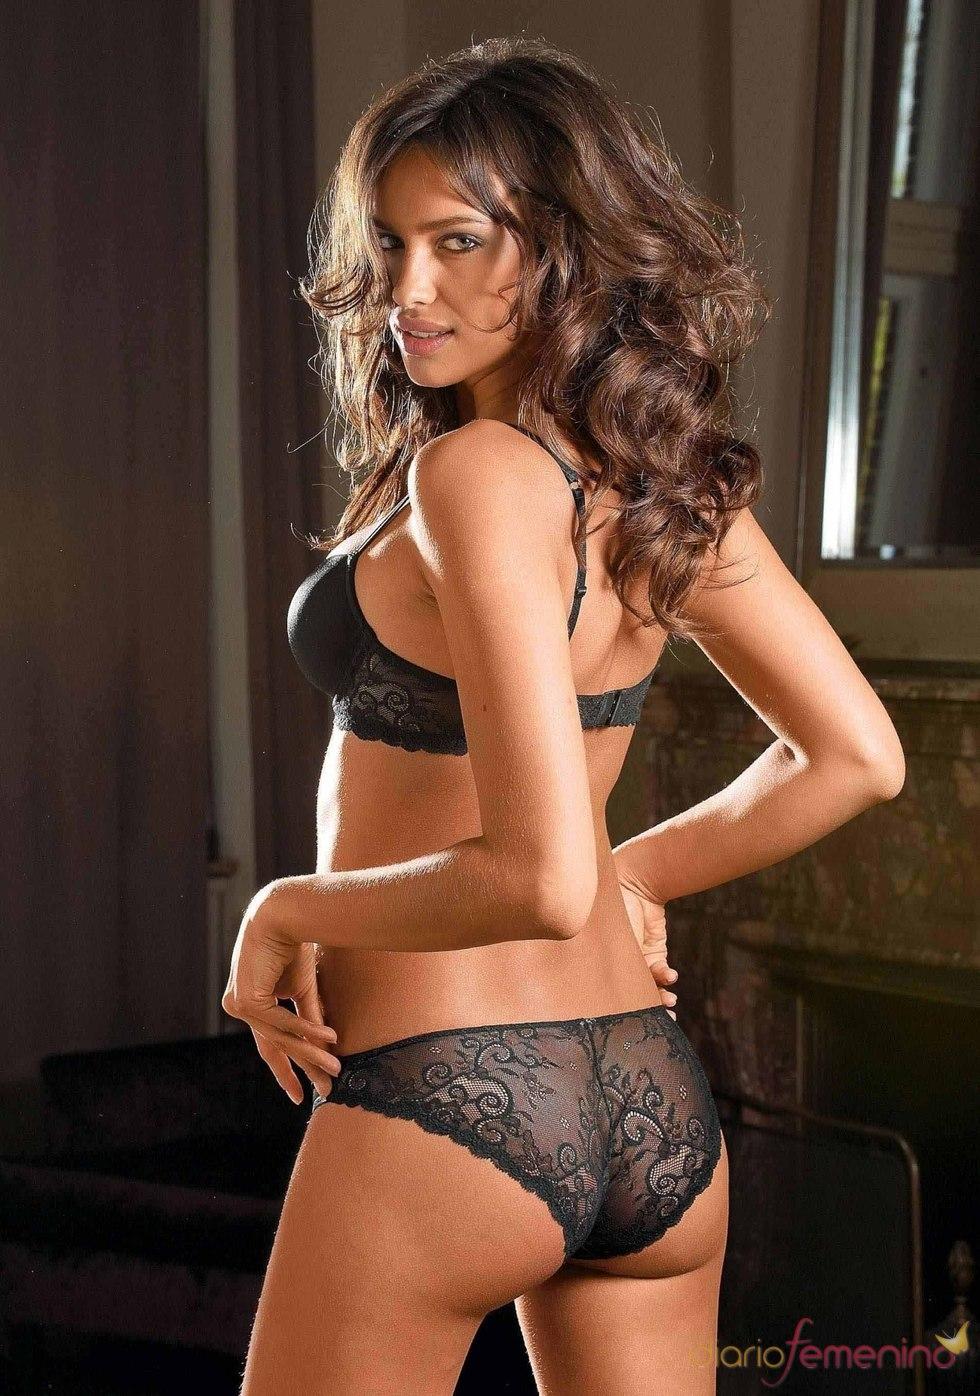 La modelo Irina Shayk posa en ropa interior para 'La Senza'